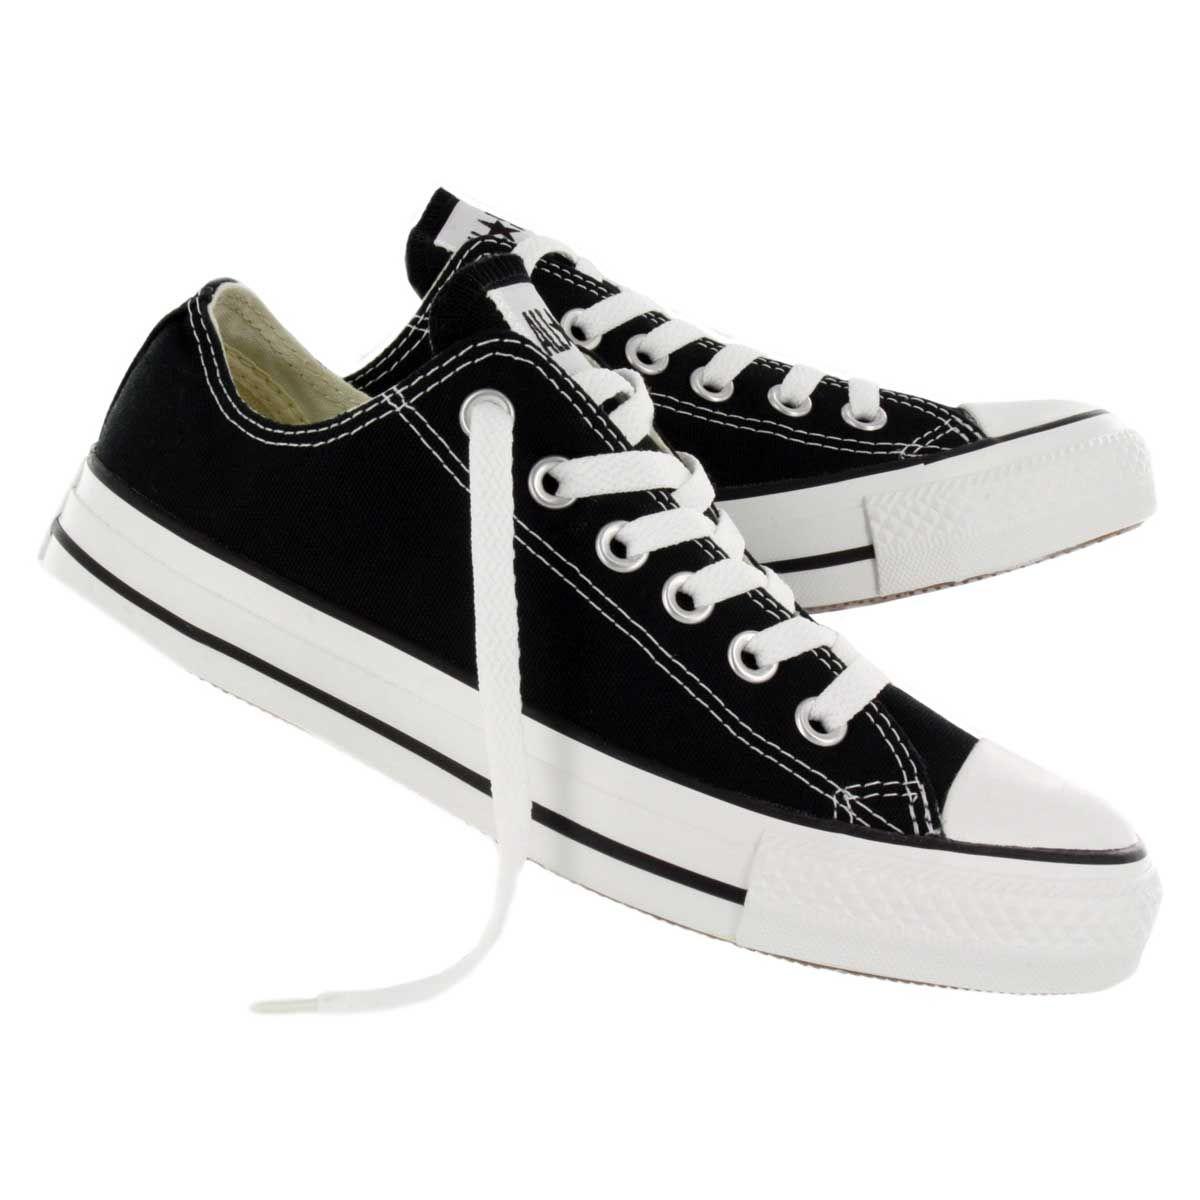 Converse Women's CHUCK TAYLOR CORE OX black sneakers M9166